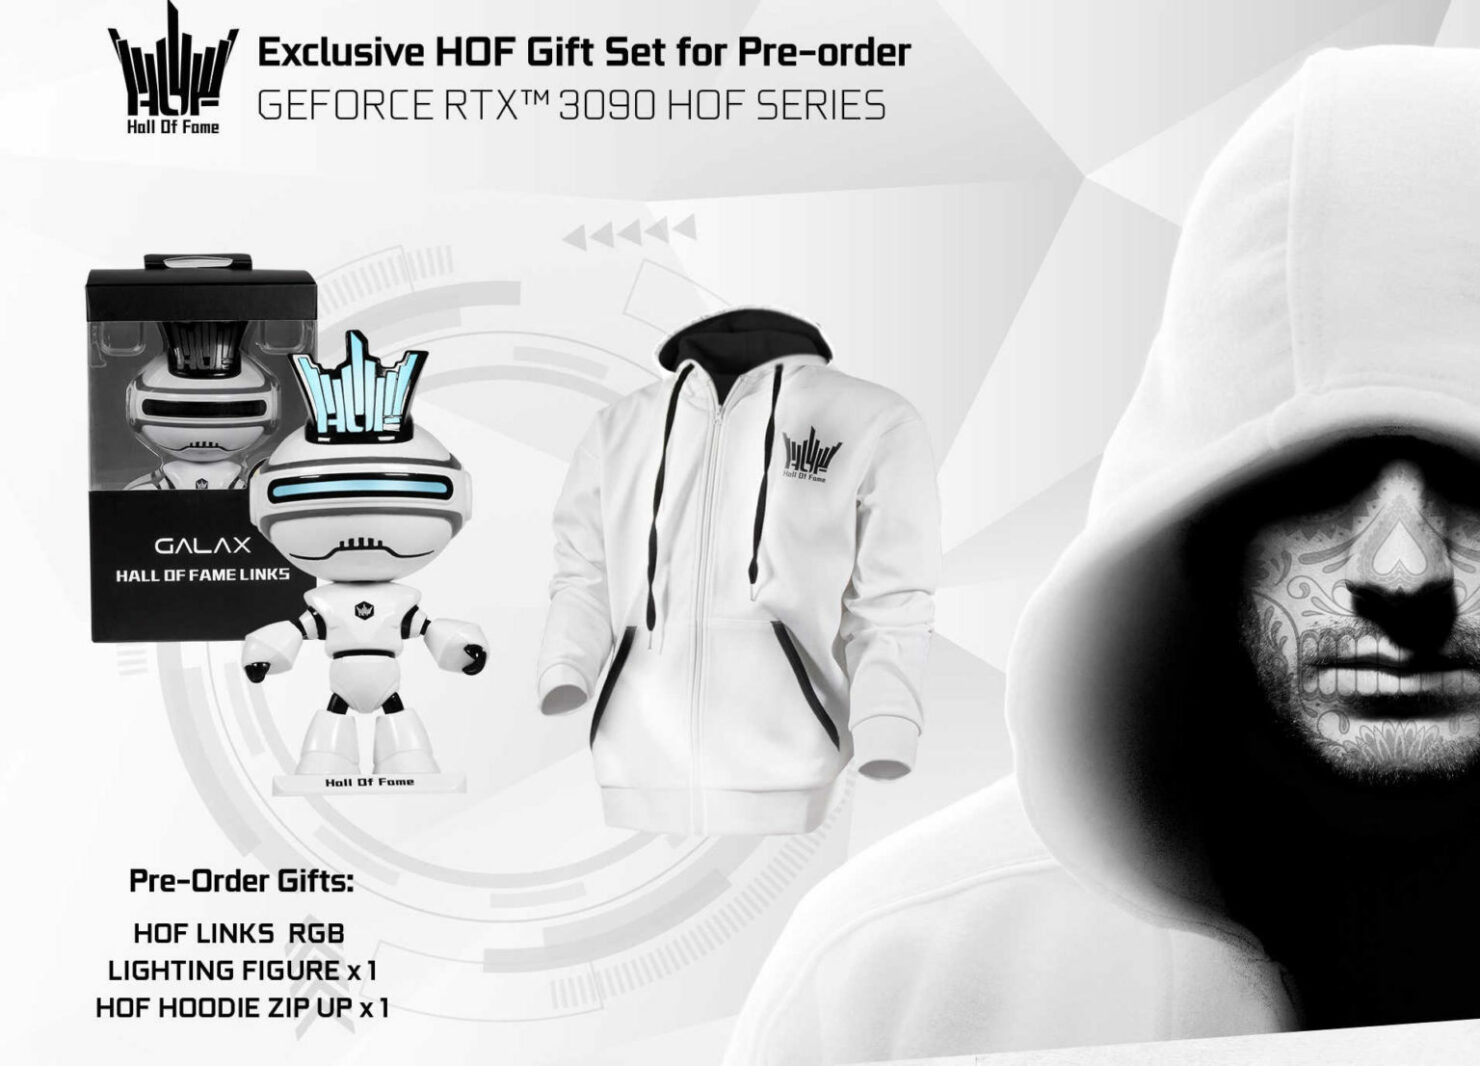 galax-rtx3090-hof-preorder-kit-1536x1106